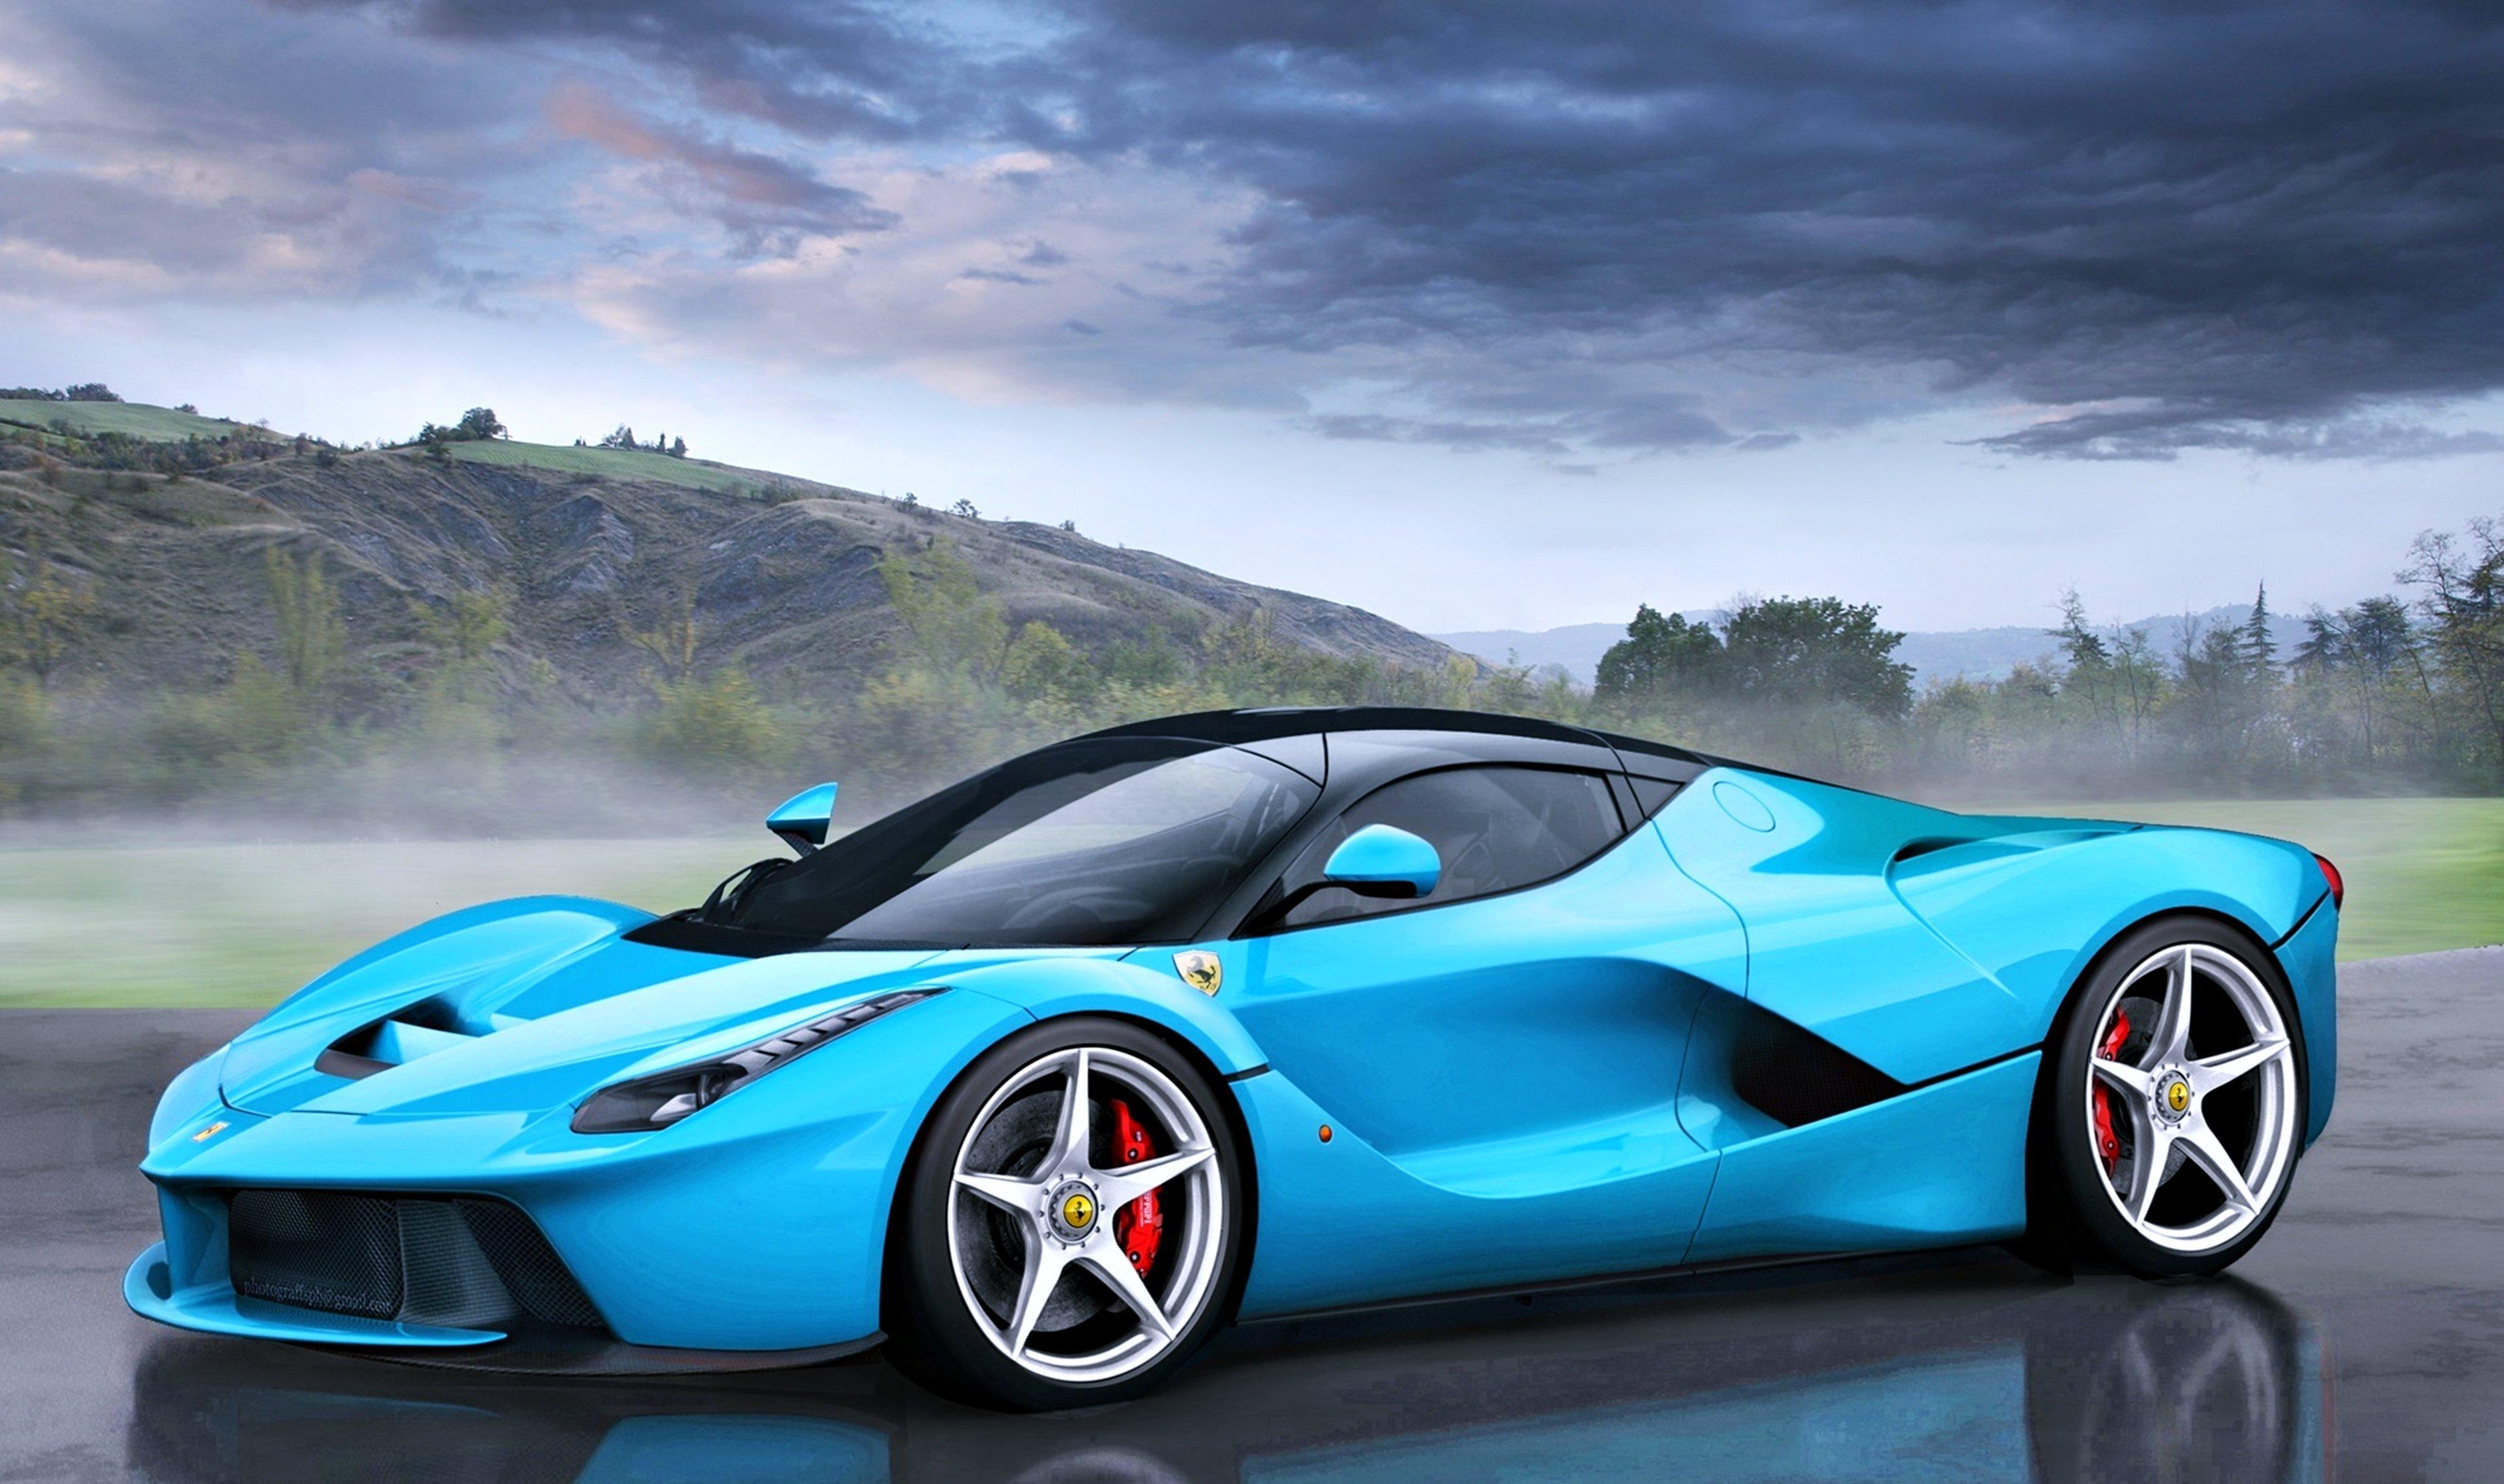 Ferrari Laferrari Tiffany Blue Fog Speed Cars Motors Ferrari Blue Race Car 3840x2276 Download Hd Wallpaper Wallpapertip